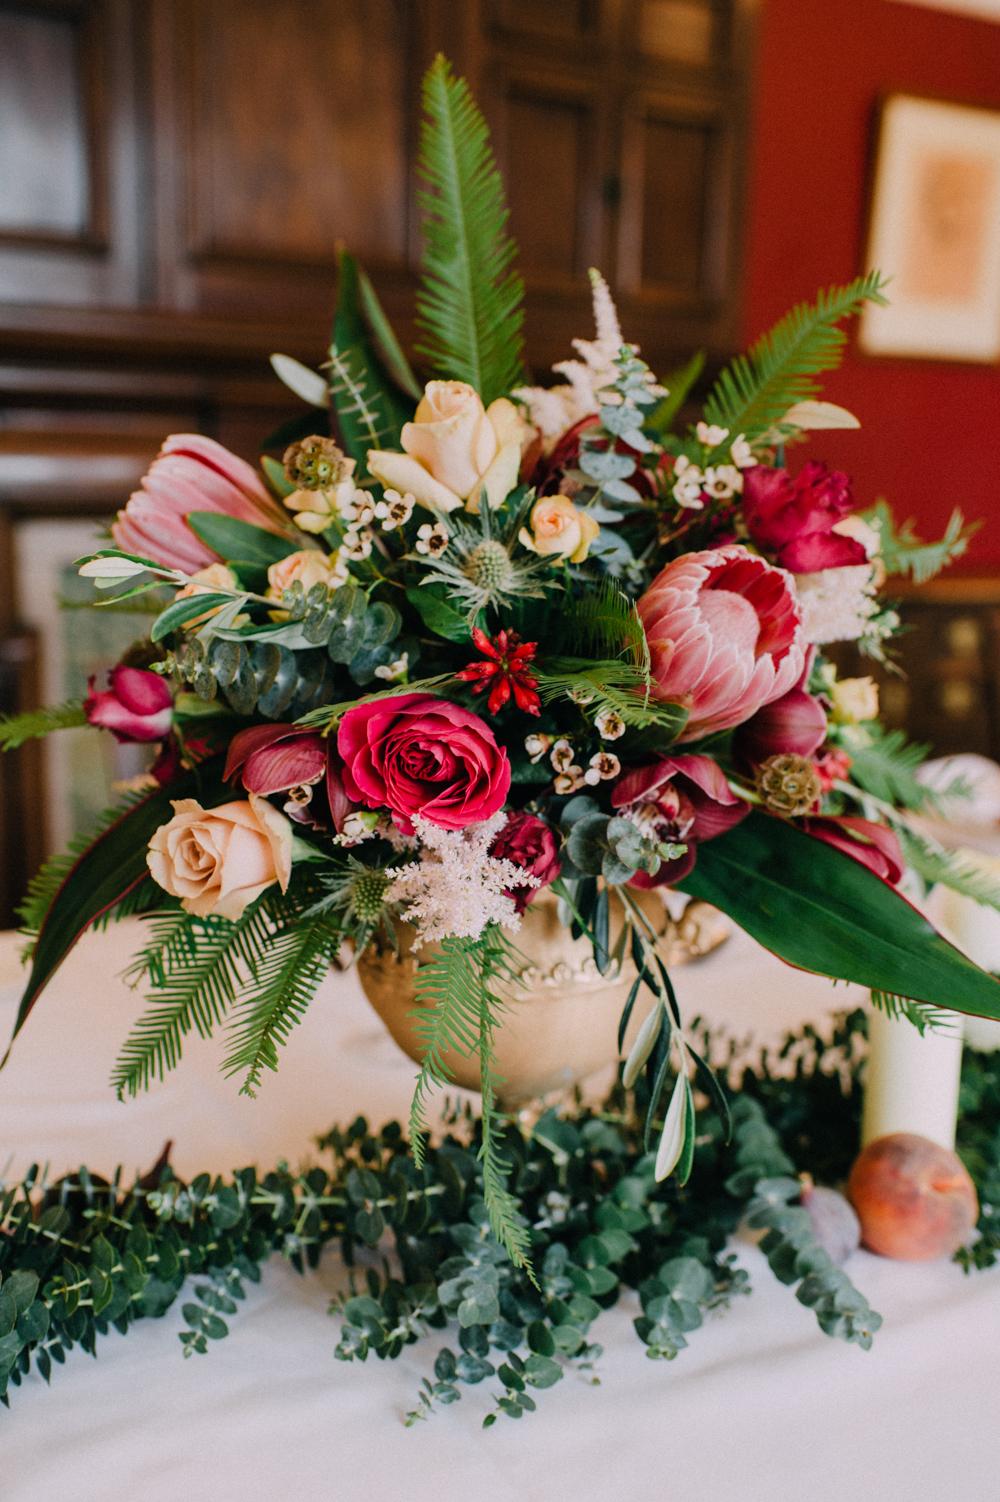 oxford_wedding_ladiesandlord-17